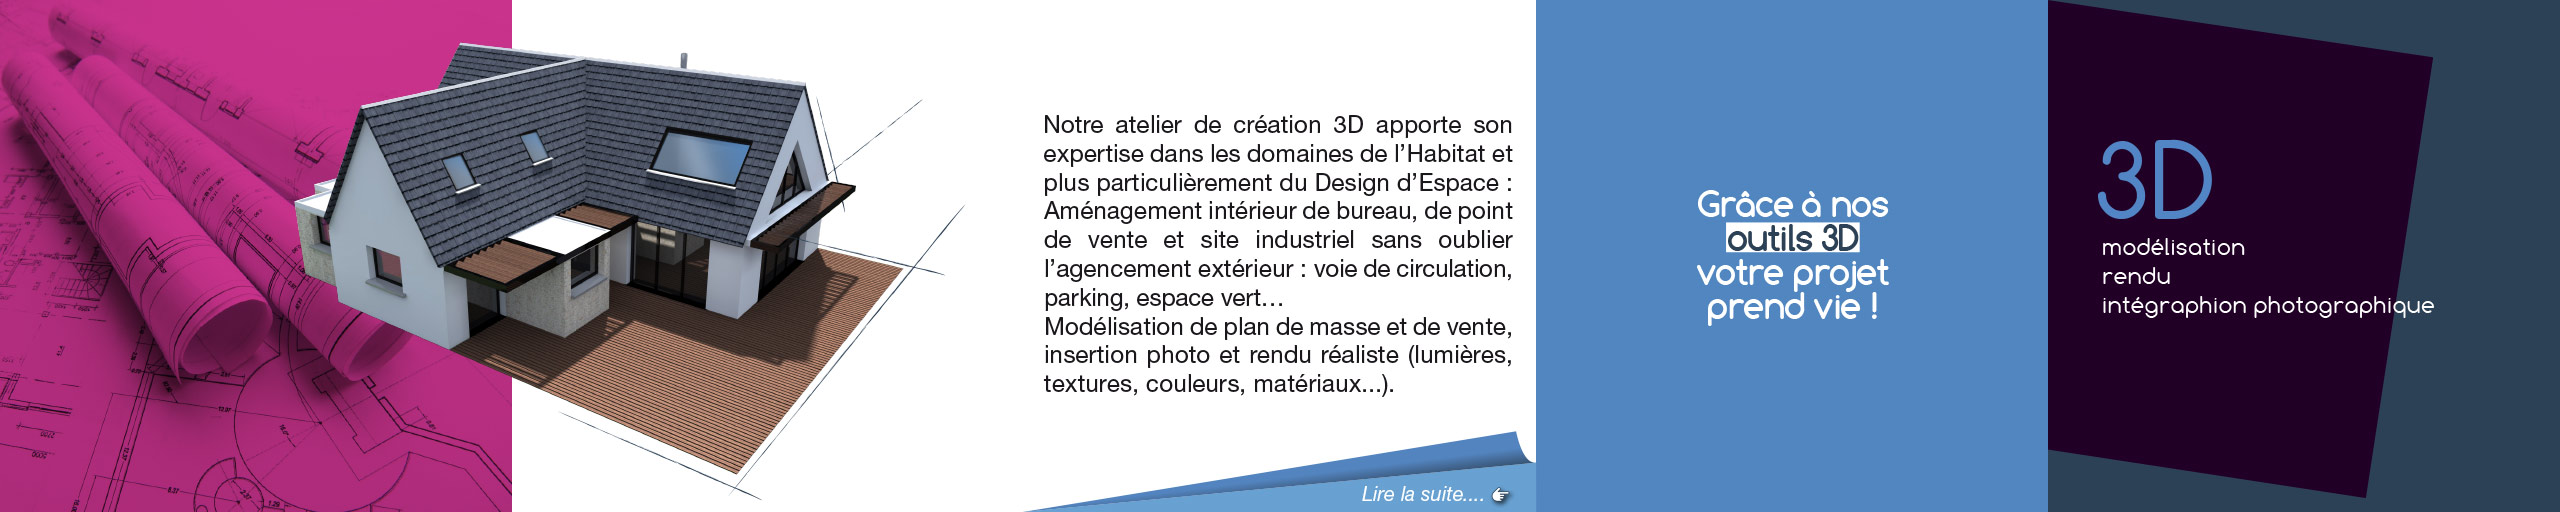 Modélisation & Rendu 3D